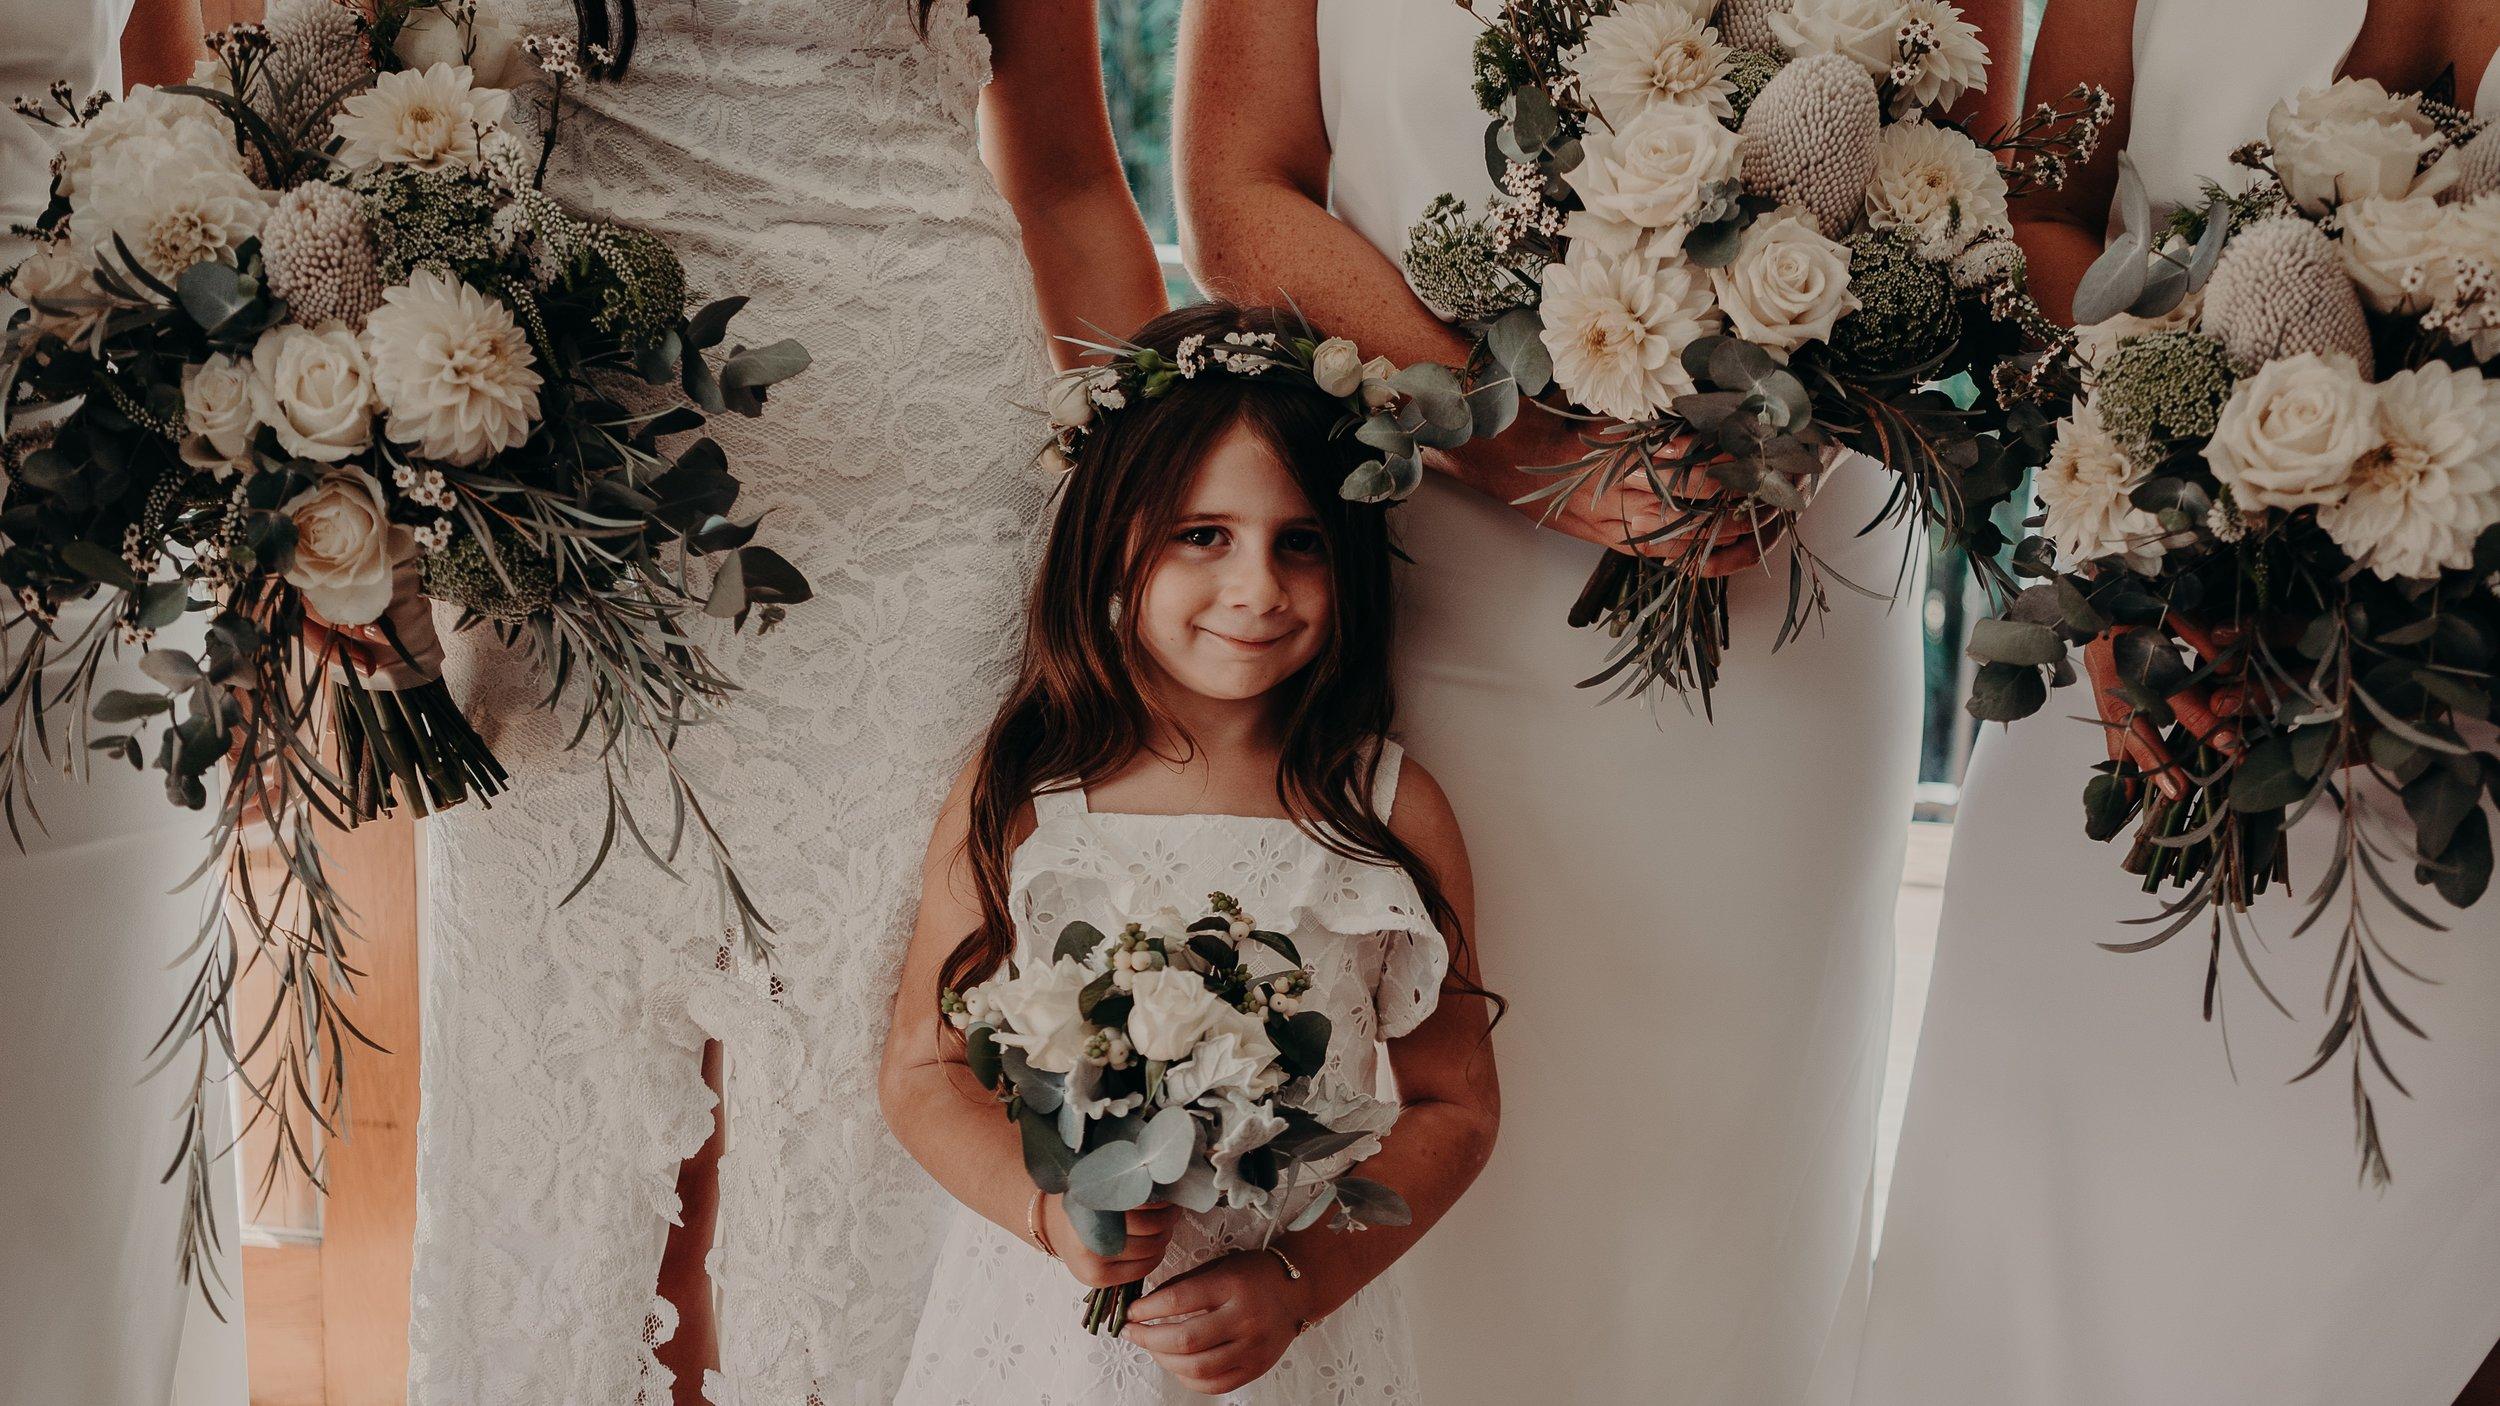 mickalathomas_puremacphotography_weddingphotographer_couplephotographer_Sheppartonphotographer_2711.jpg